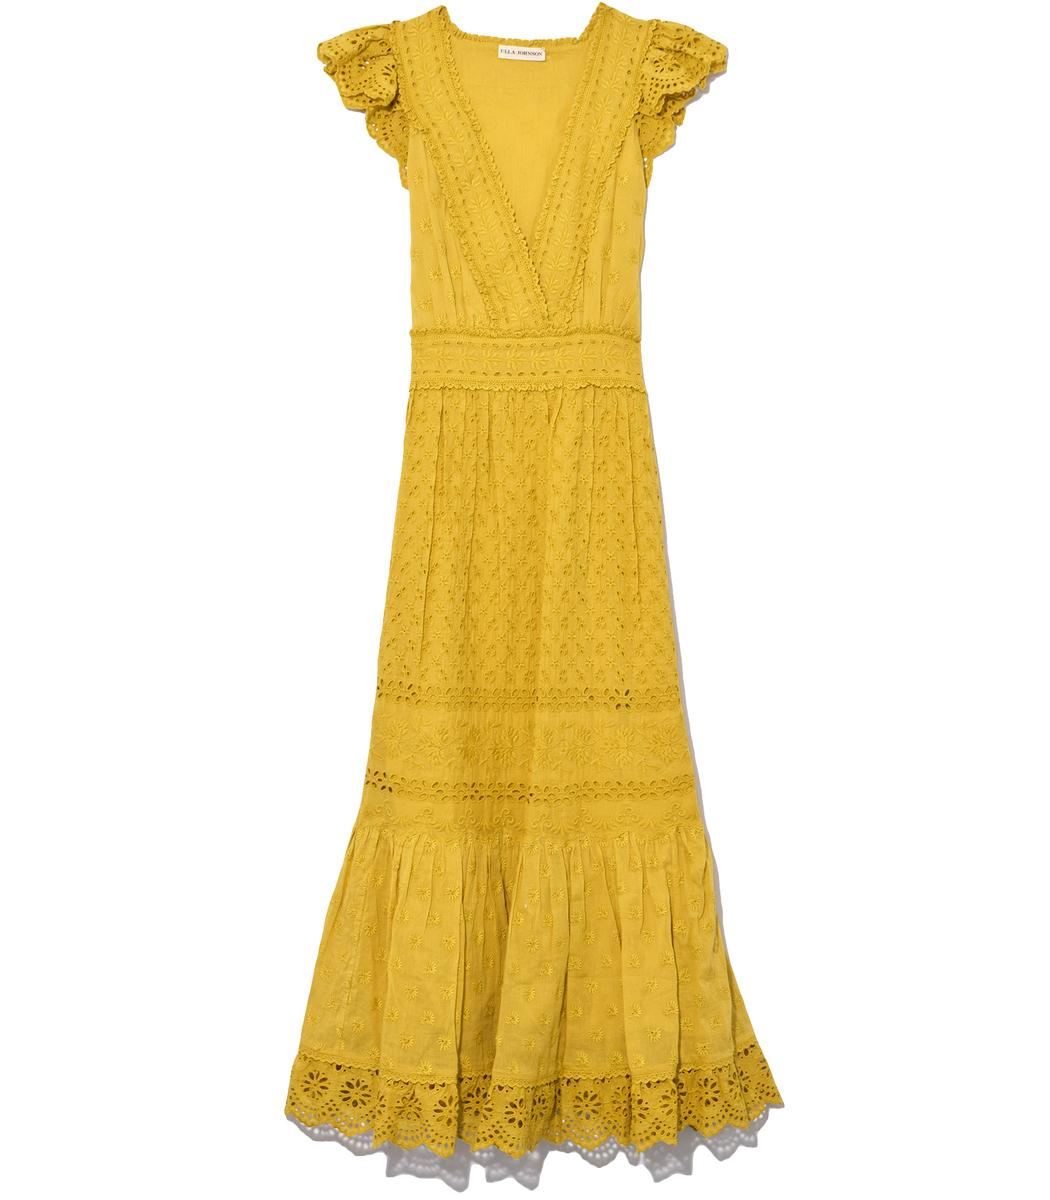 Ulla Johnson Marjorie Dress In Chartreuse